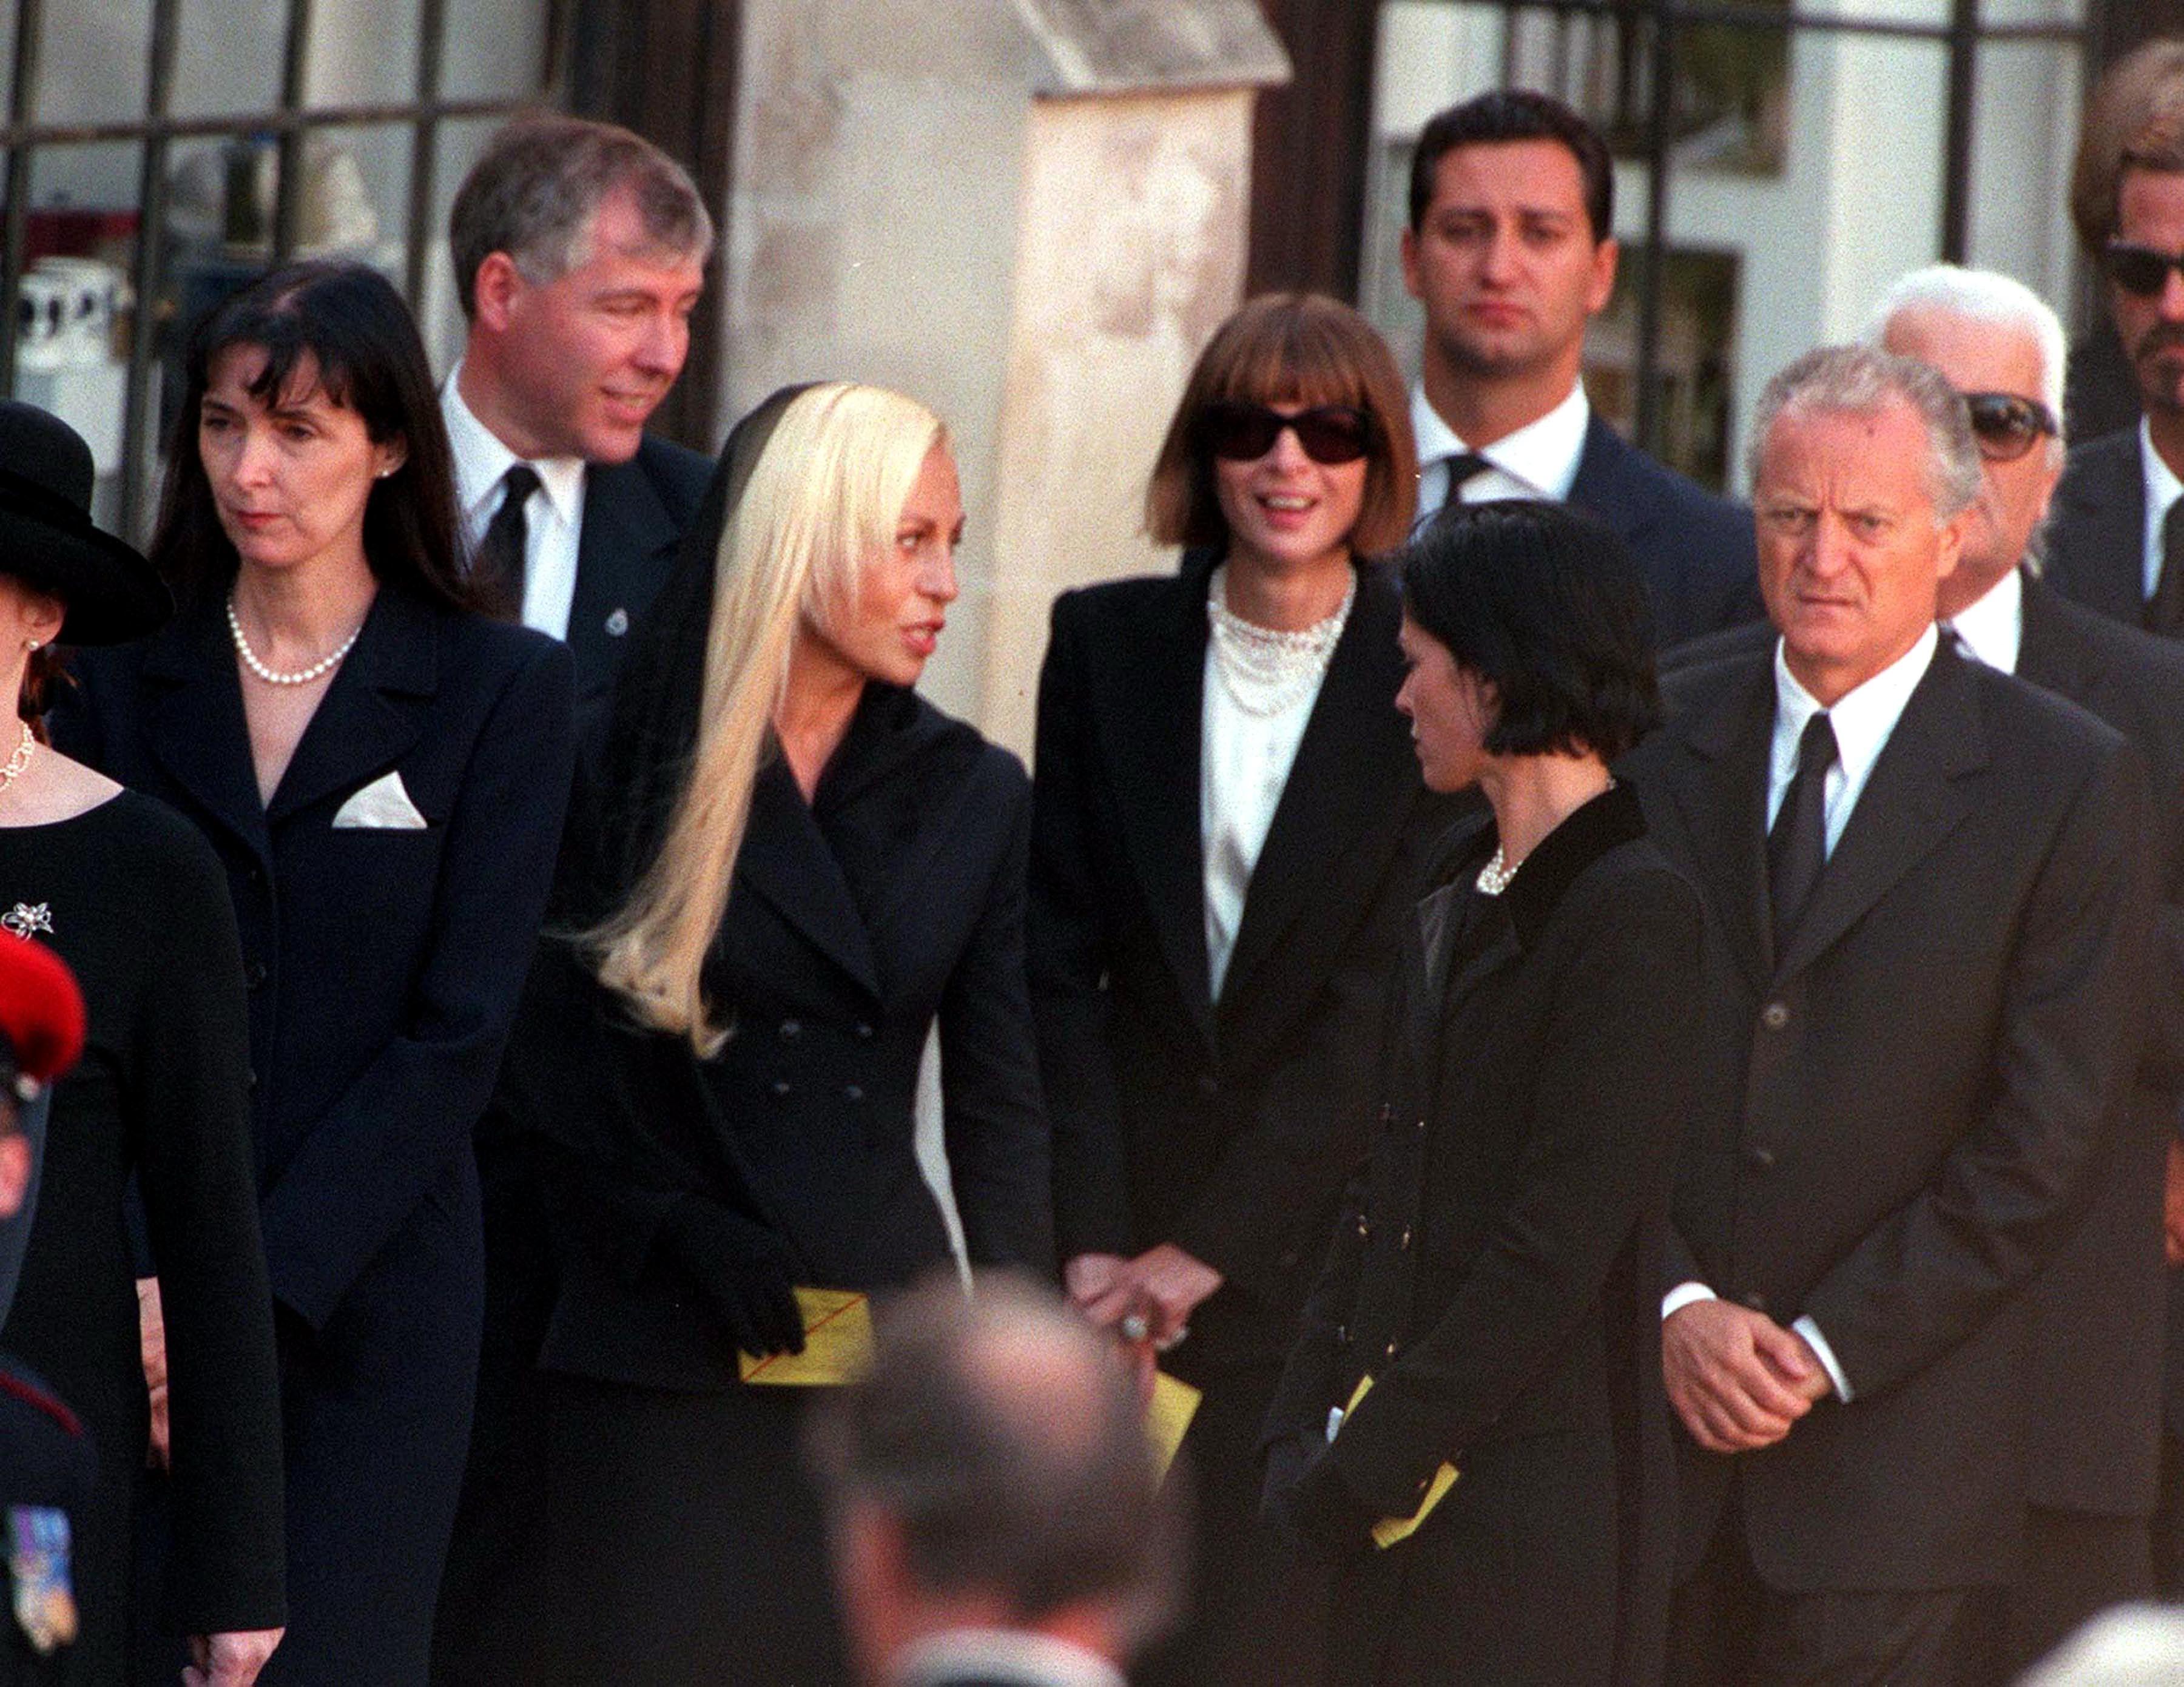 princess diana funeral photos 30 unforgettable moments at the funeral of princess diana princess diana funeral photos 30